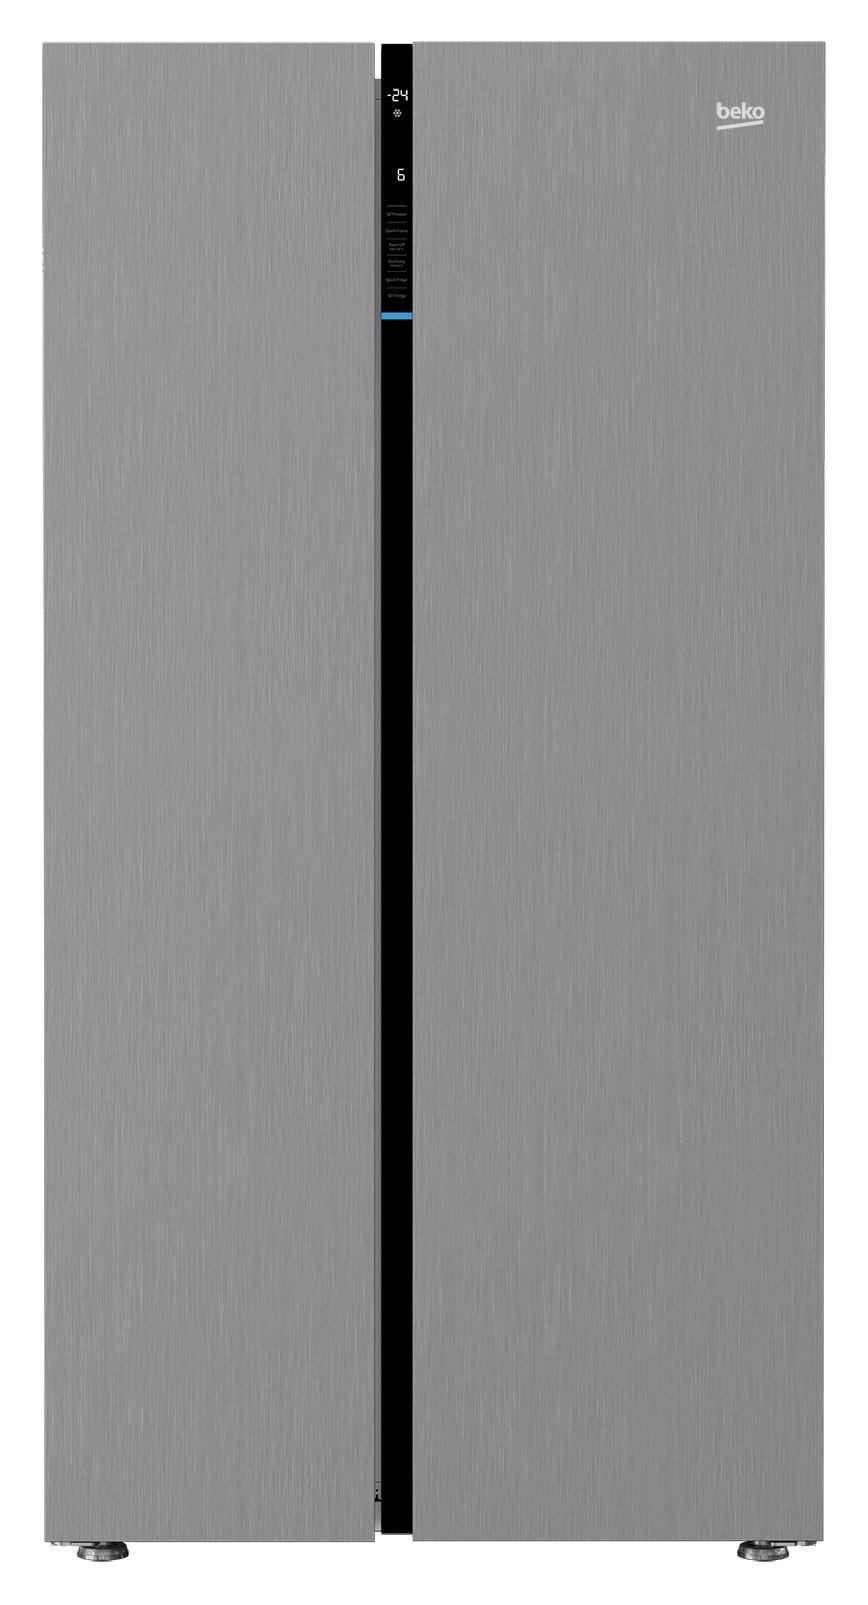 Frigider Side By Side Beko GN163122X, 558l, Inox antiamprenta, A+, Neo Frost